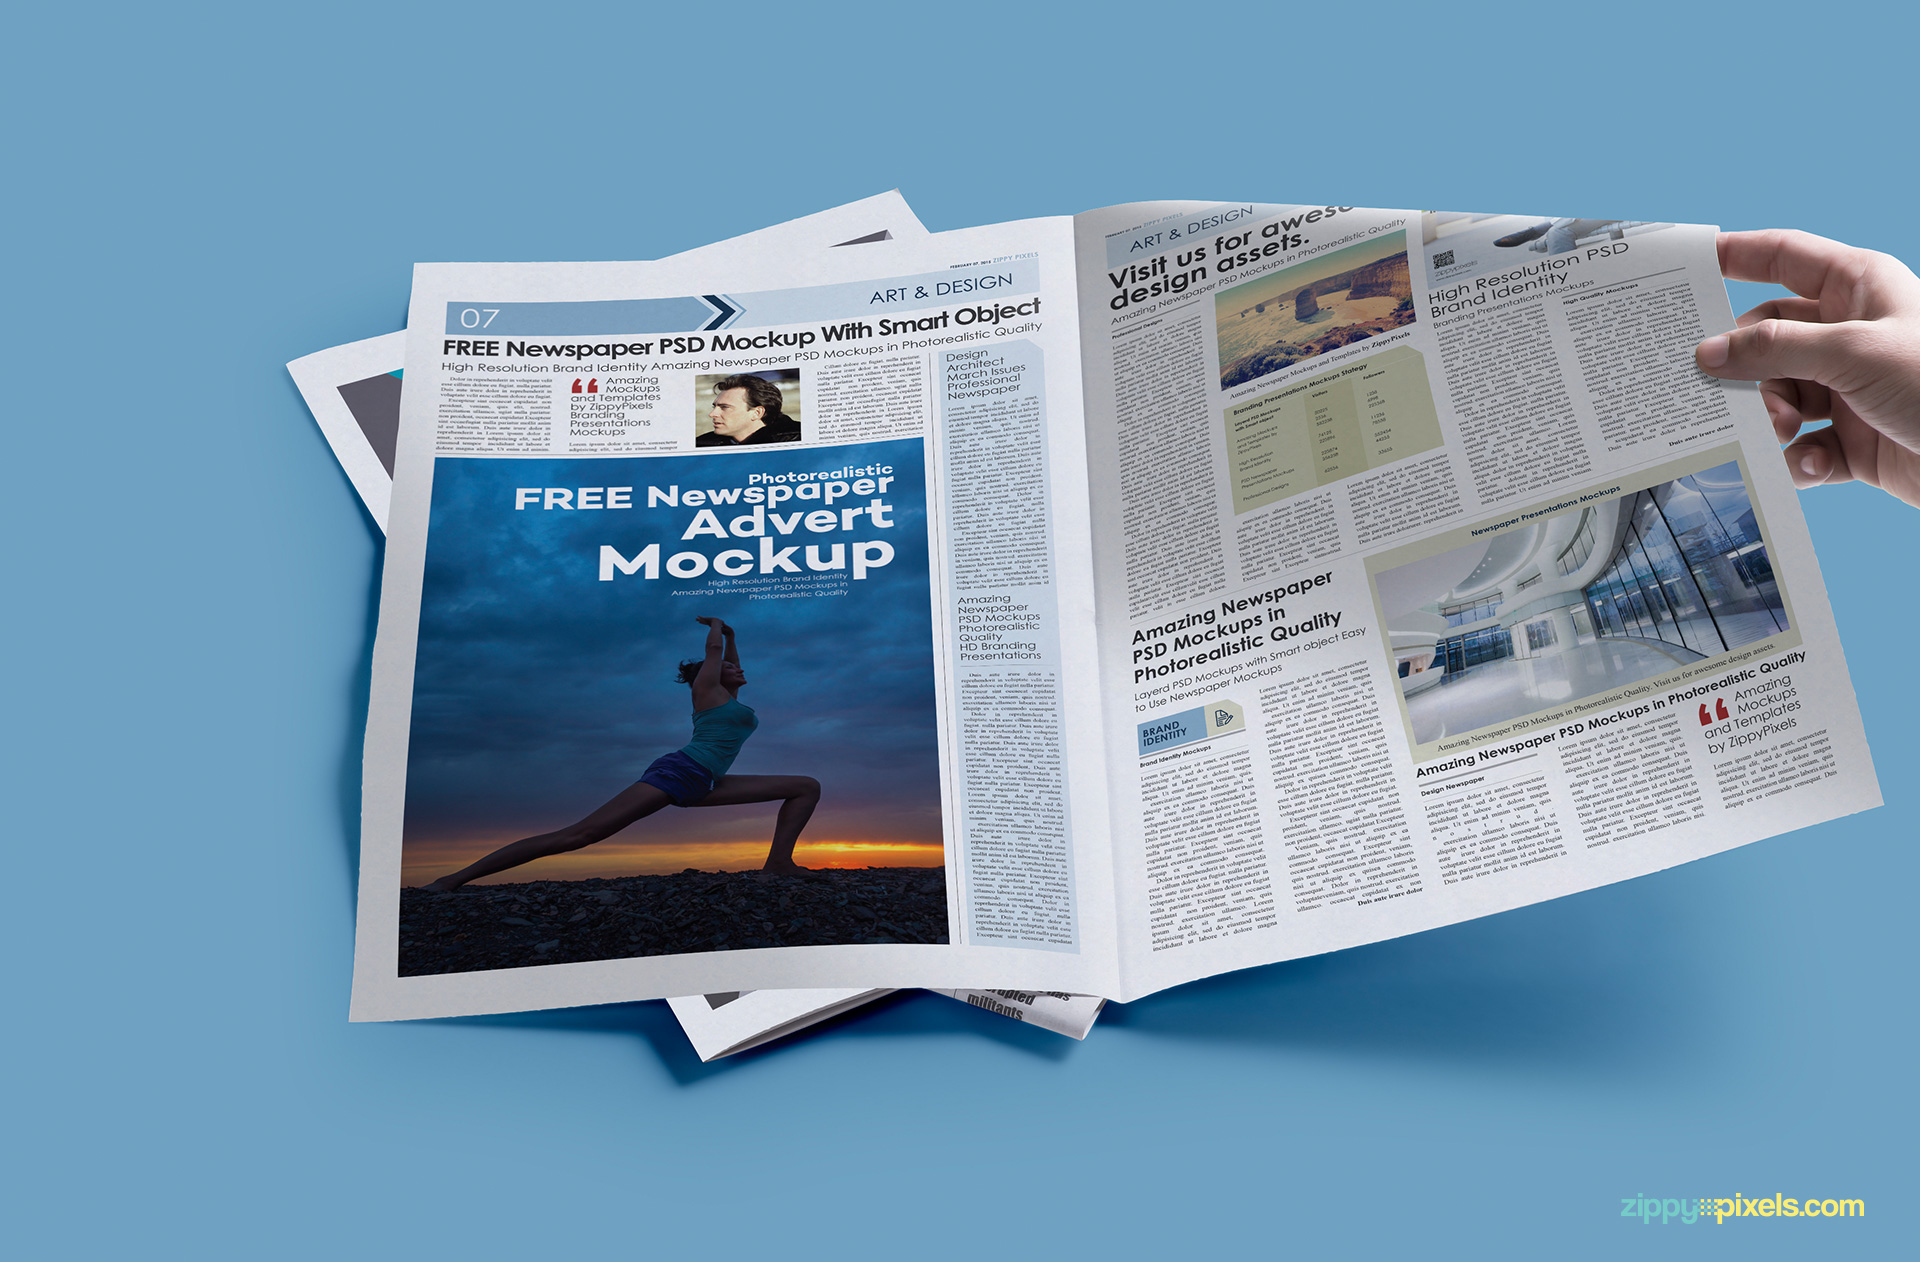 Free Print Ad Mockup Psd Zippypixels